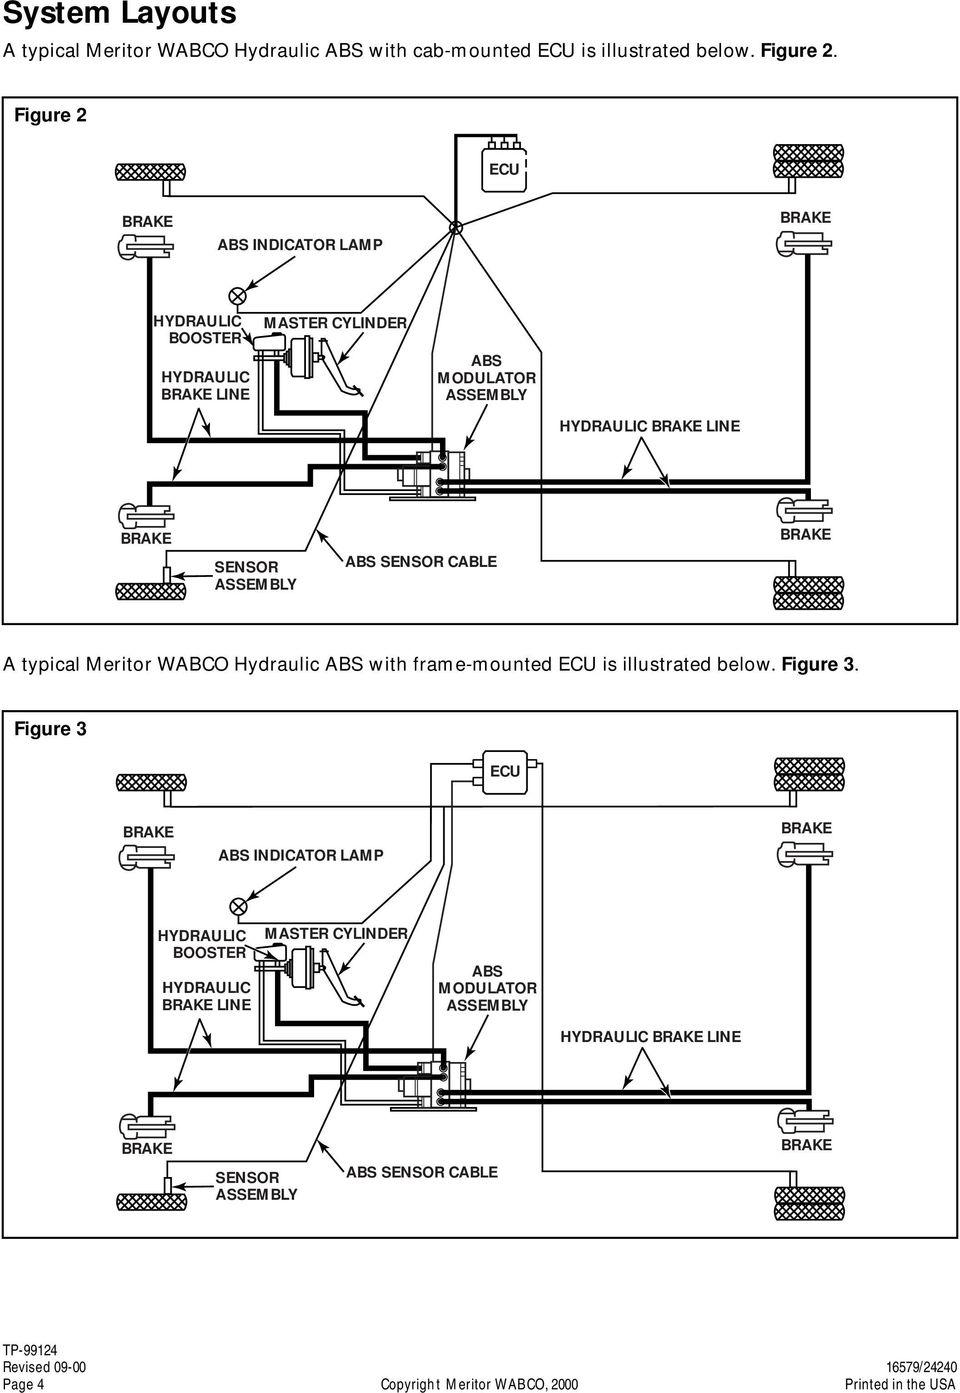 meritor abs wiring diagram power cord gz 8960  travel trailer wiring diagram further meritor wabco  gz 8960  travel trailer wiring diagram